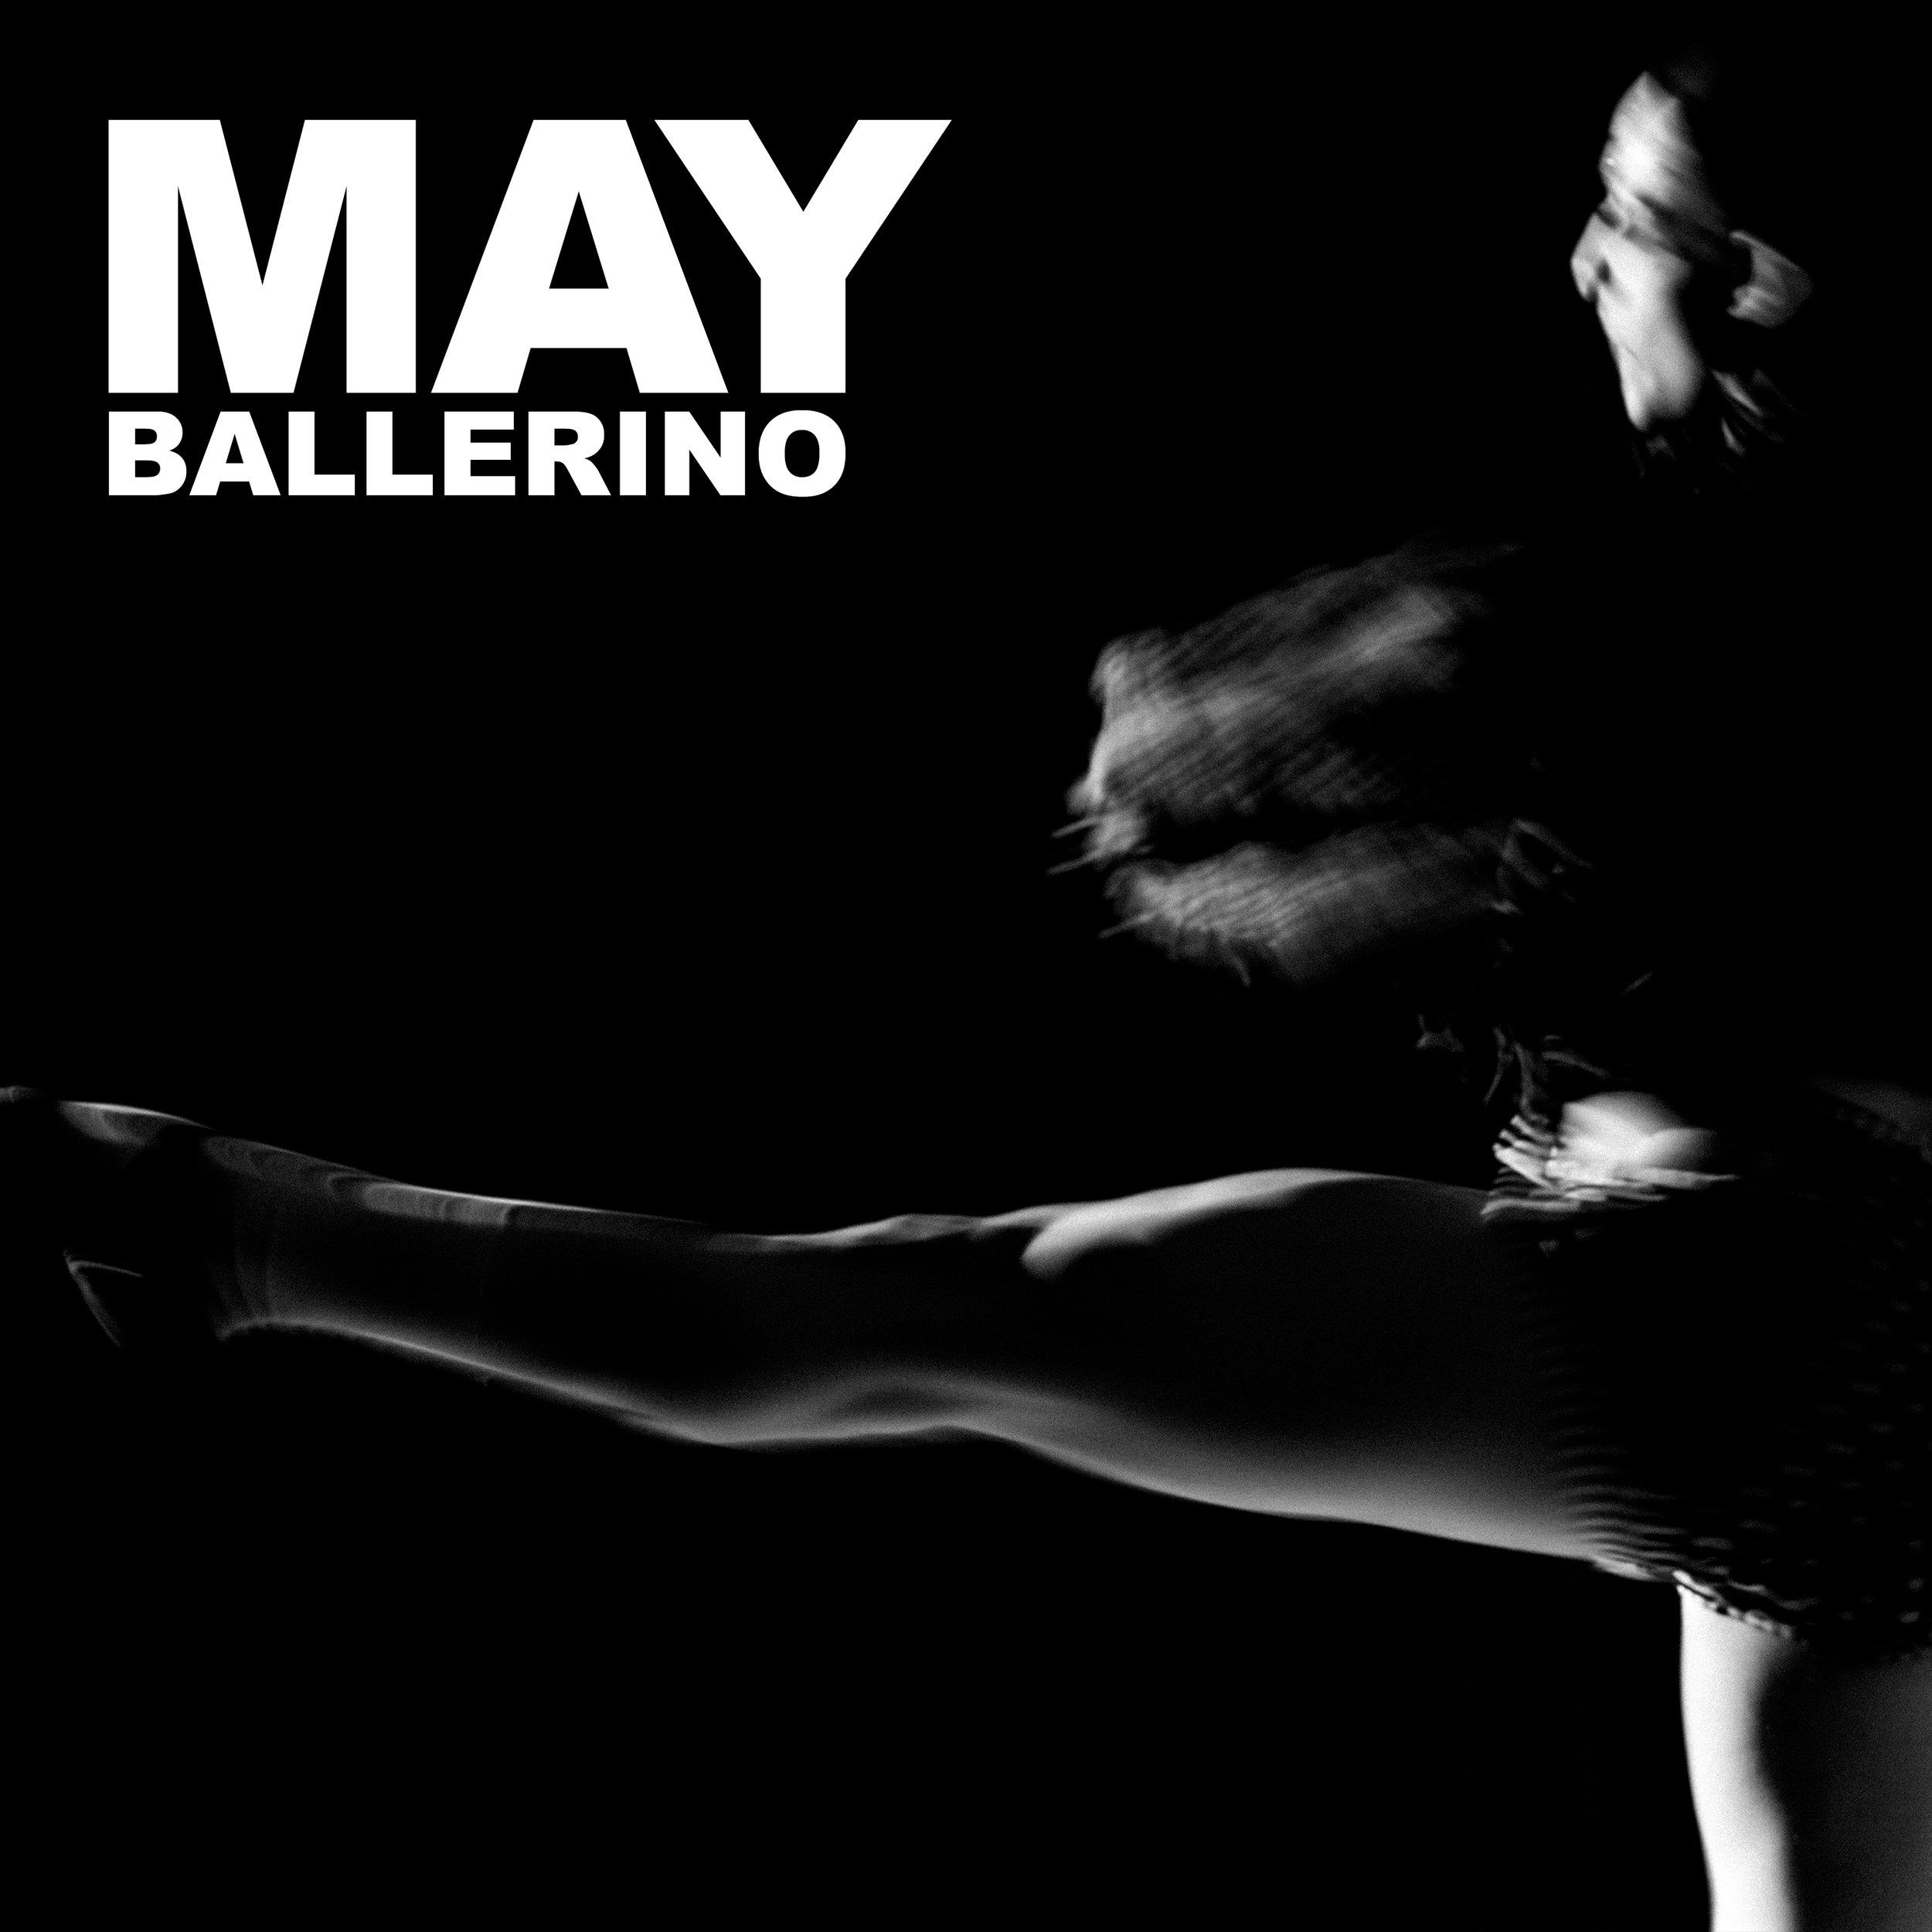 MAY - Ballerino (2017 single)